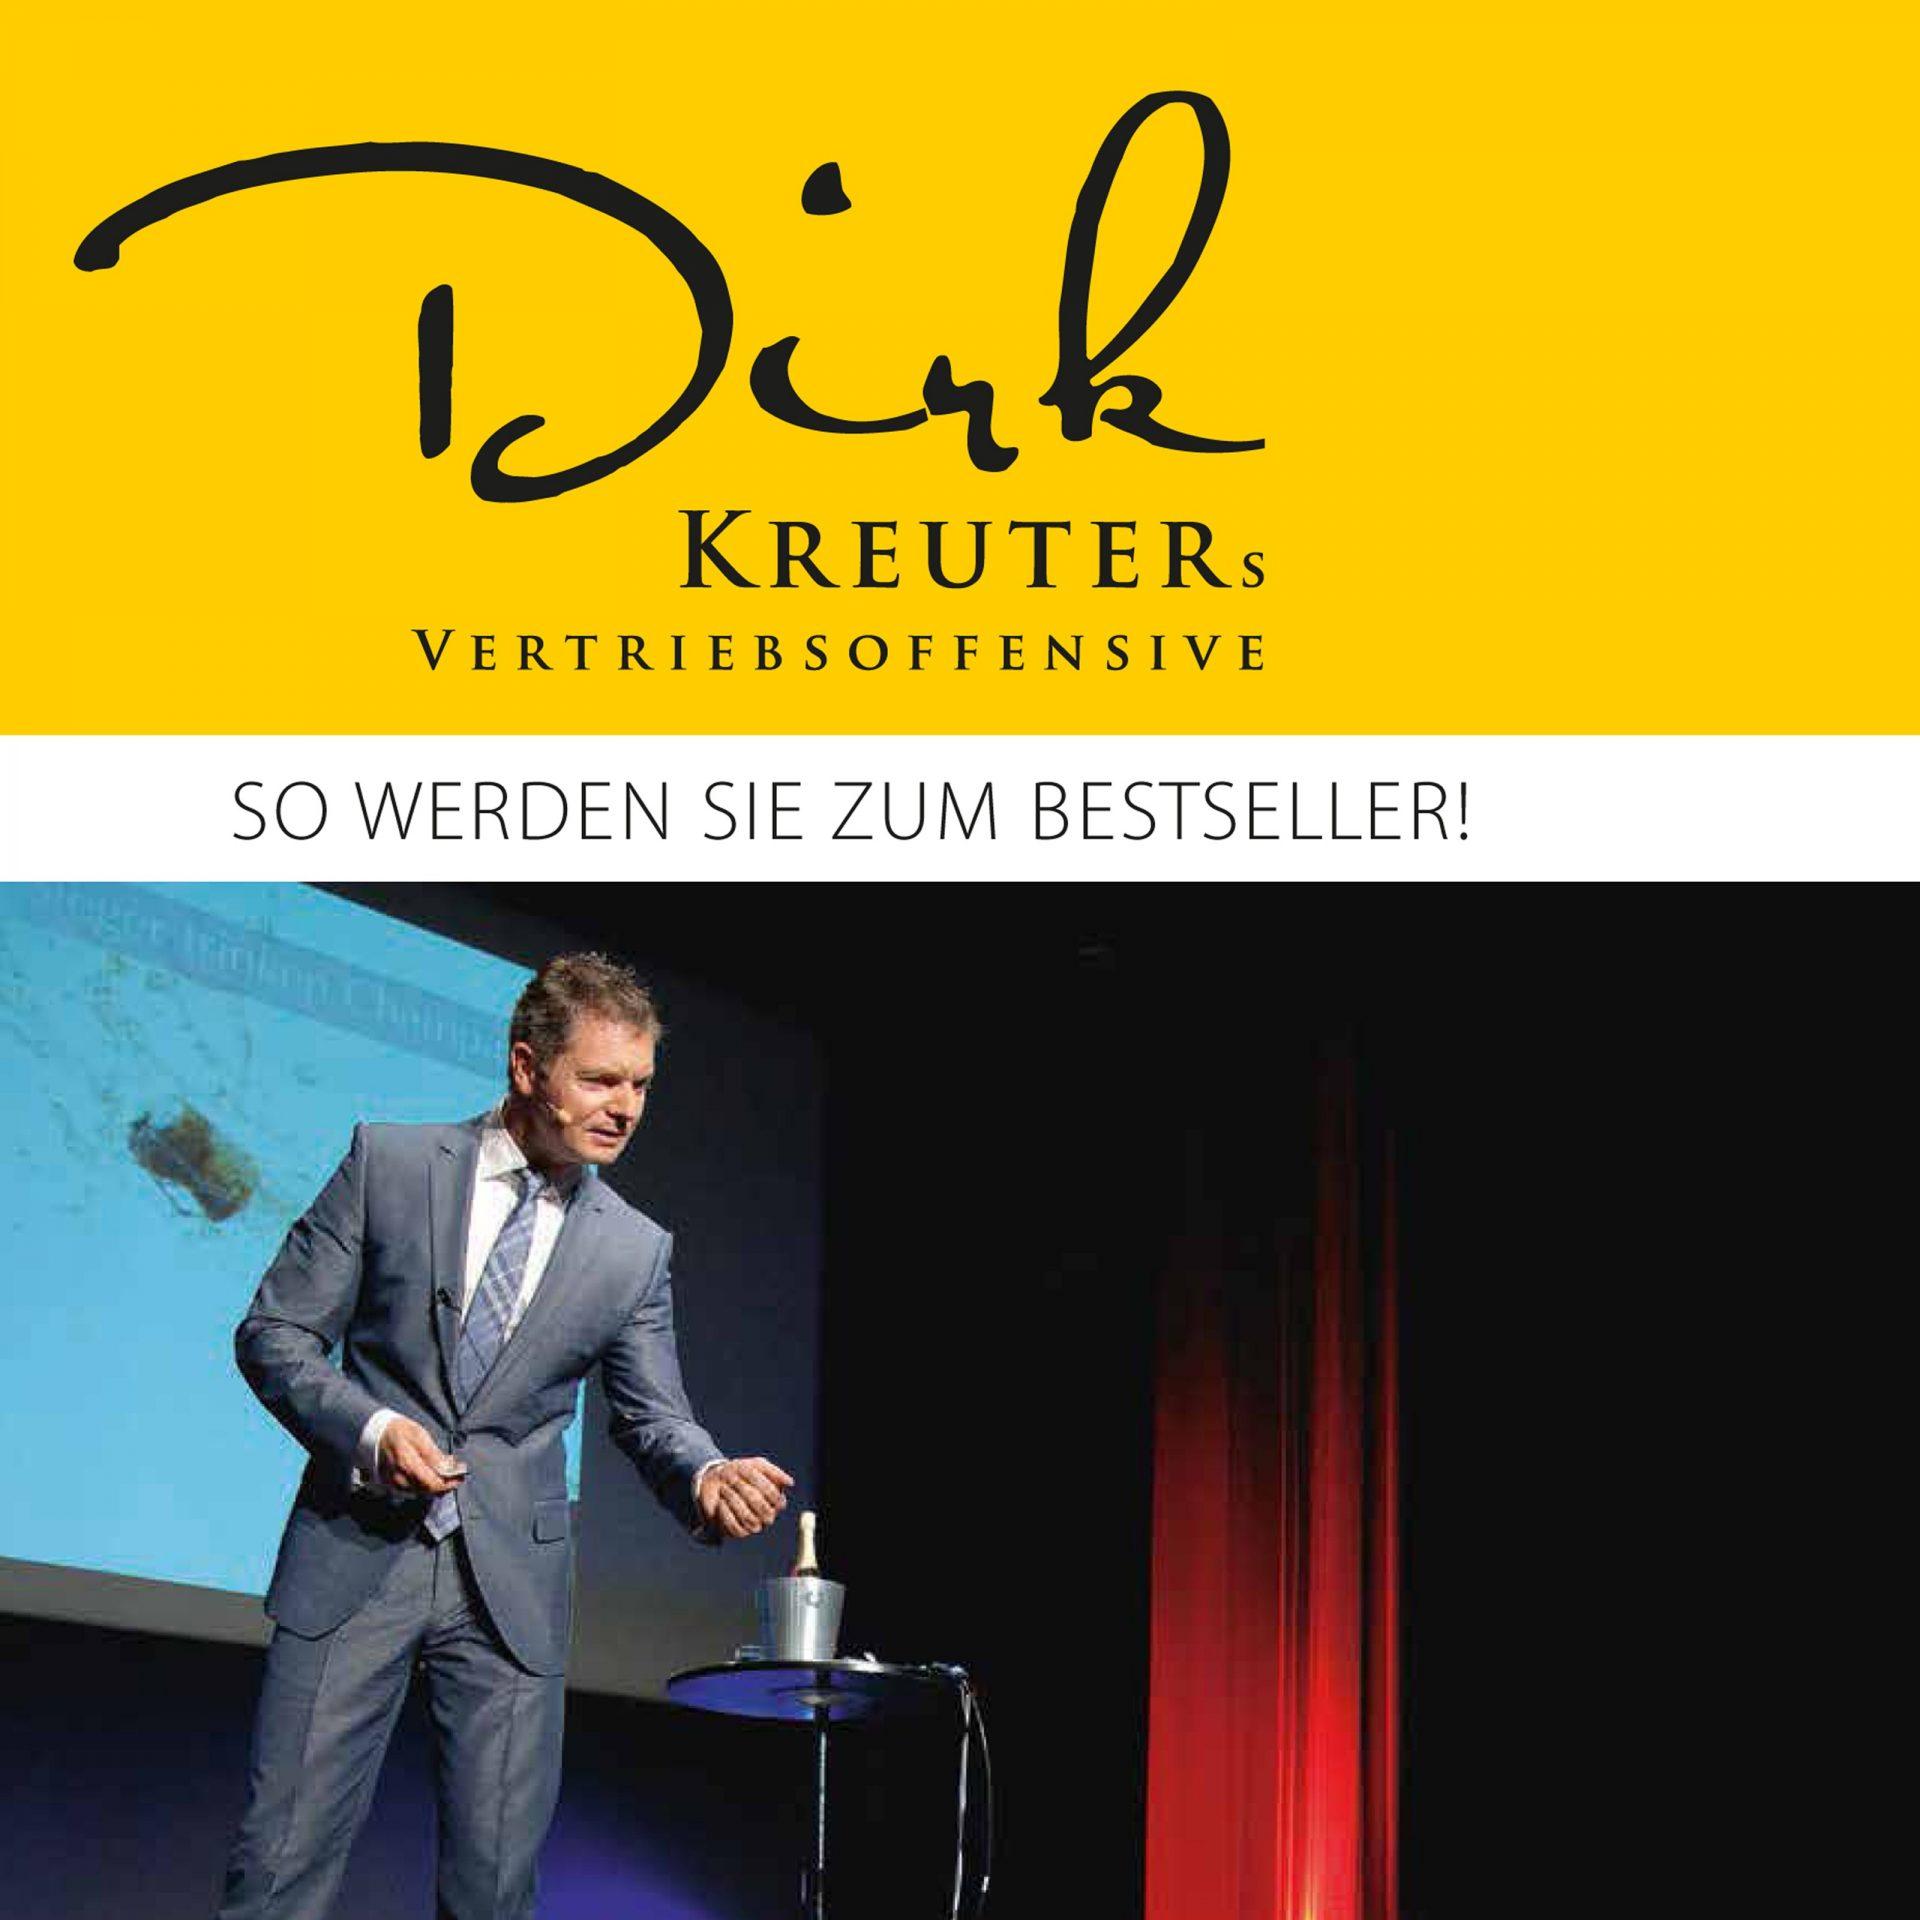 Dirk Kreuter – Vertriebsoffensive – Fast ausverkauft – Sei JETZT dabei!